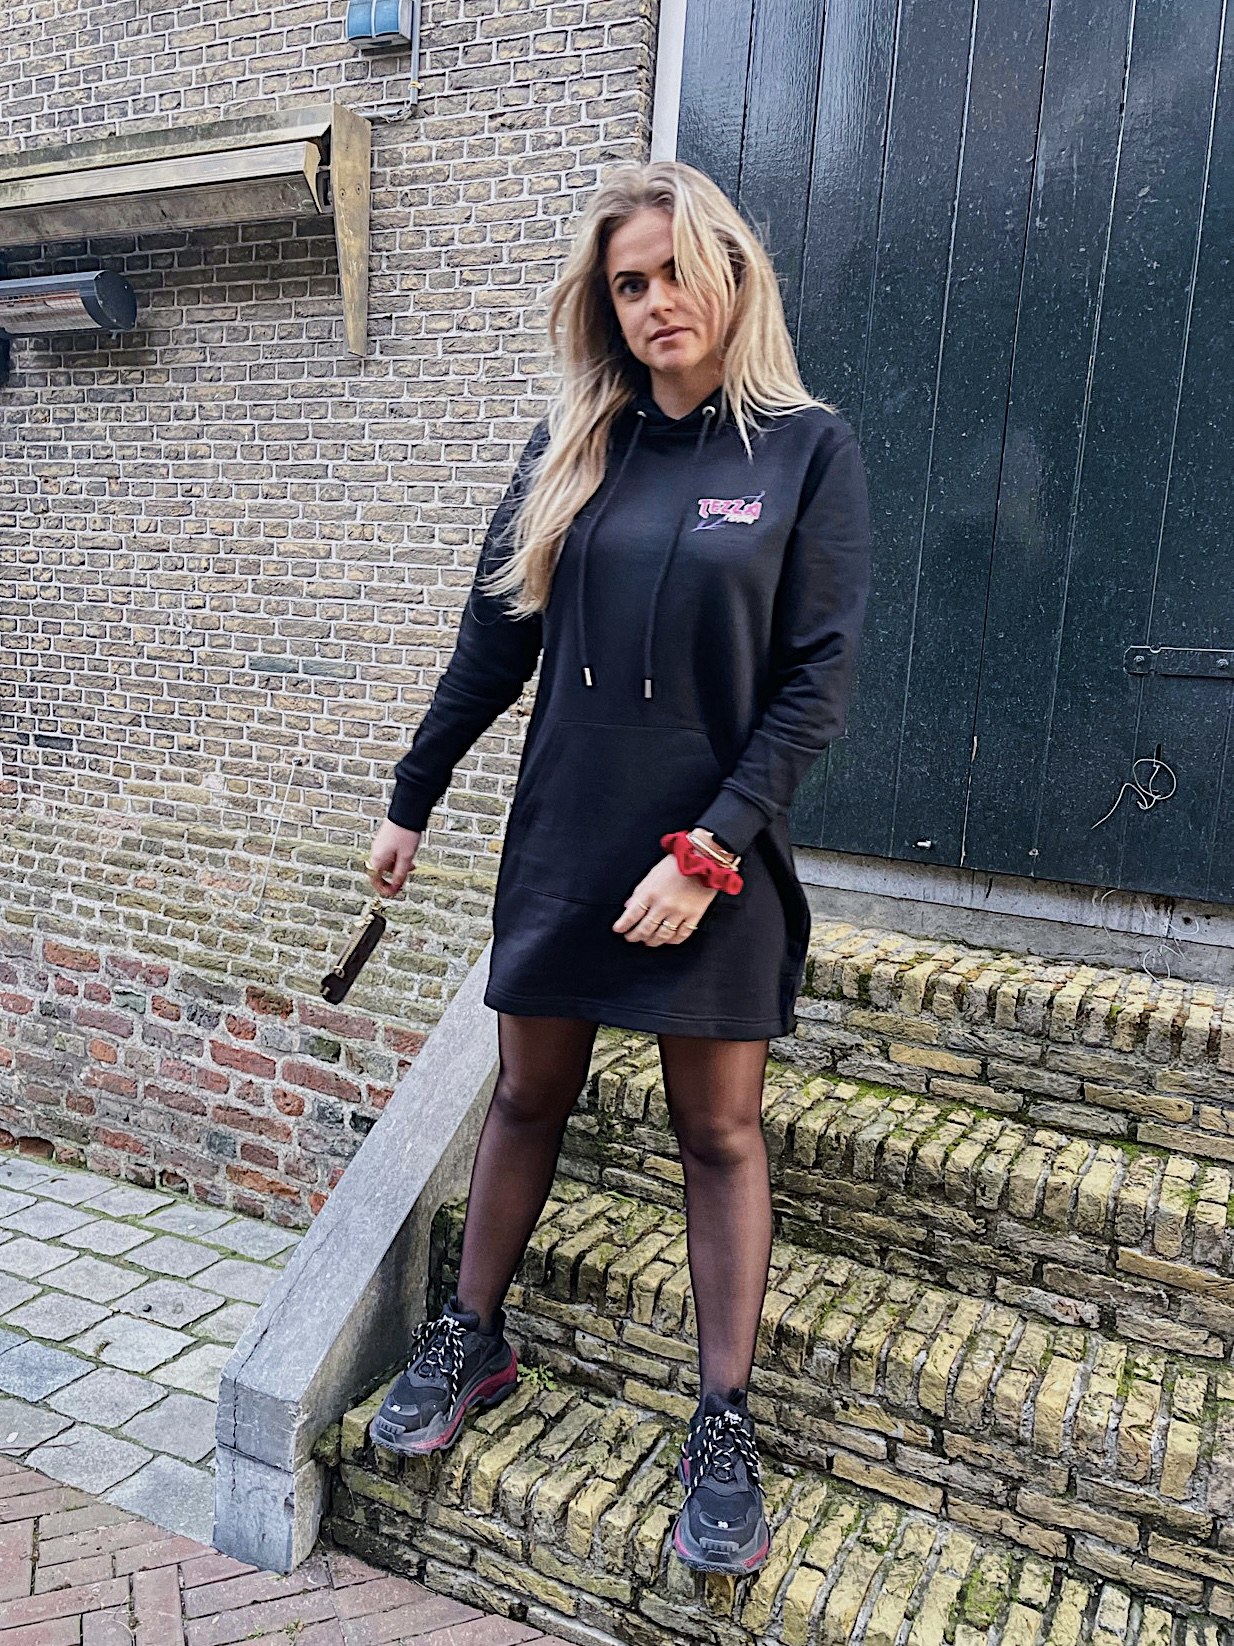 Tessa Zwartepoorte